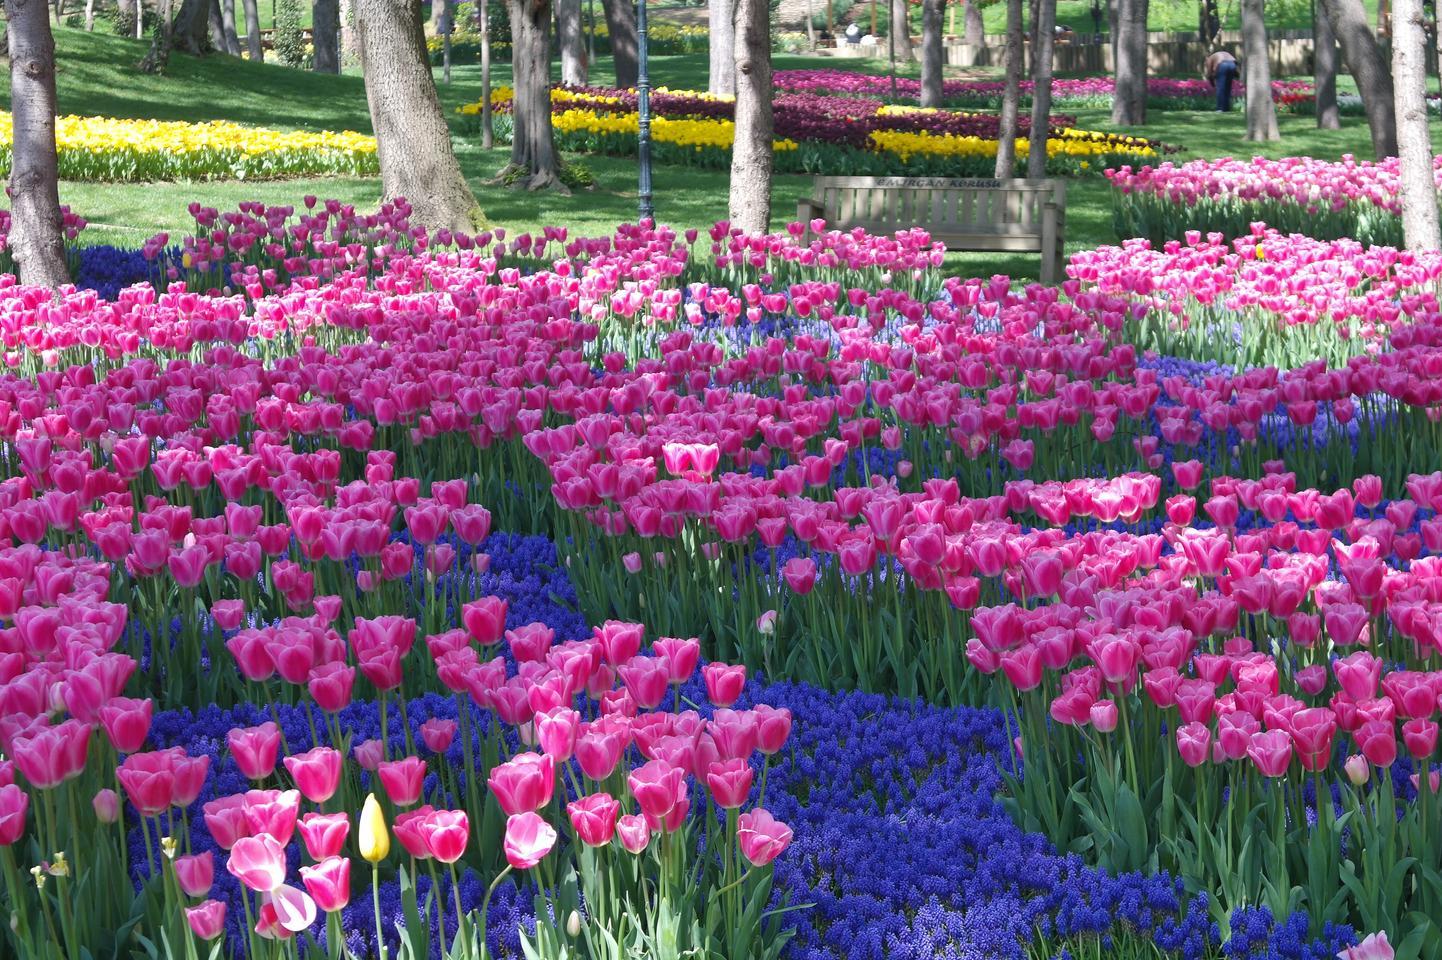 Фото фестиваля тюльпанов